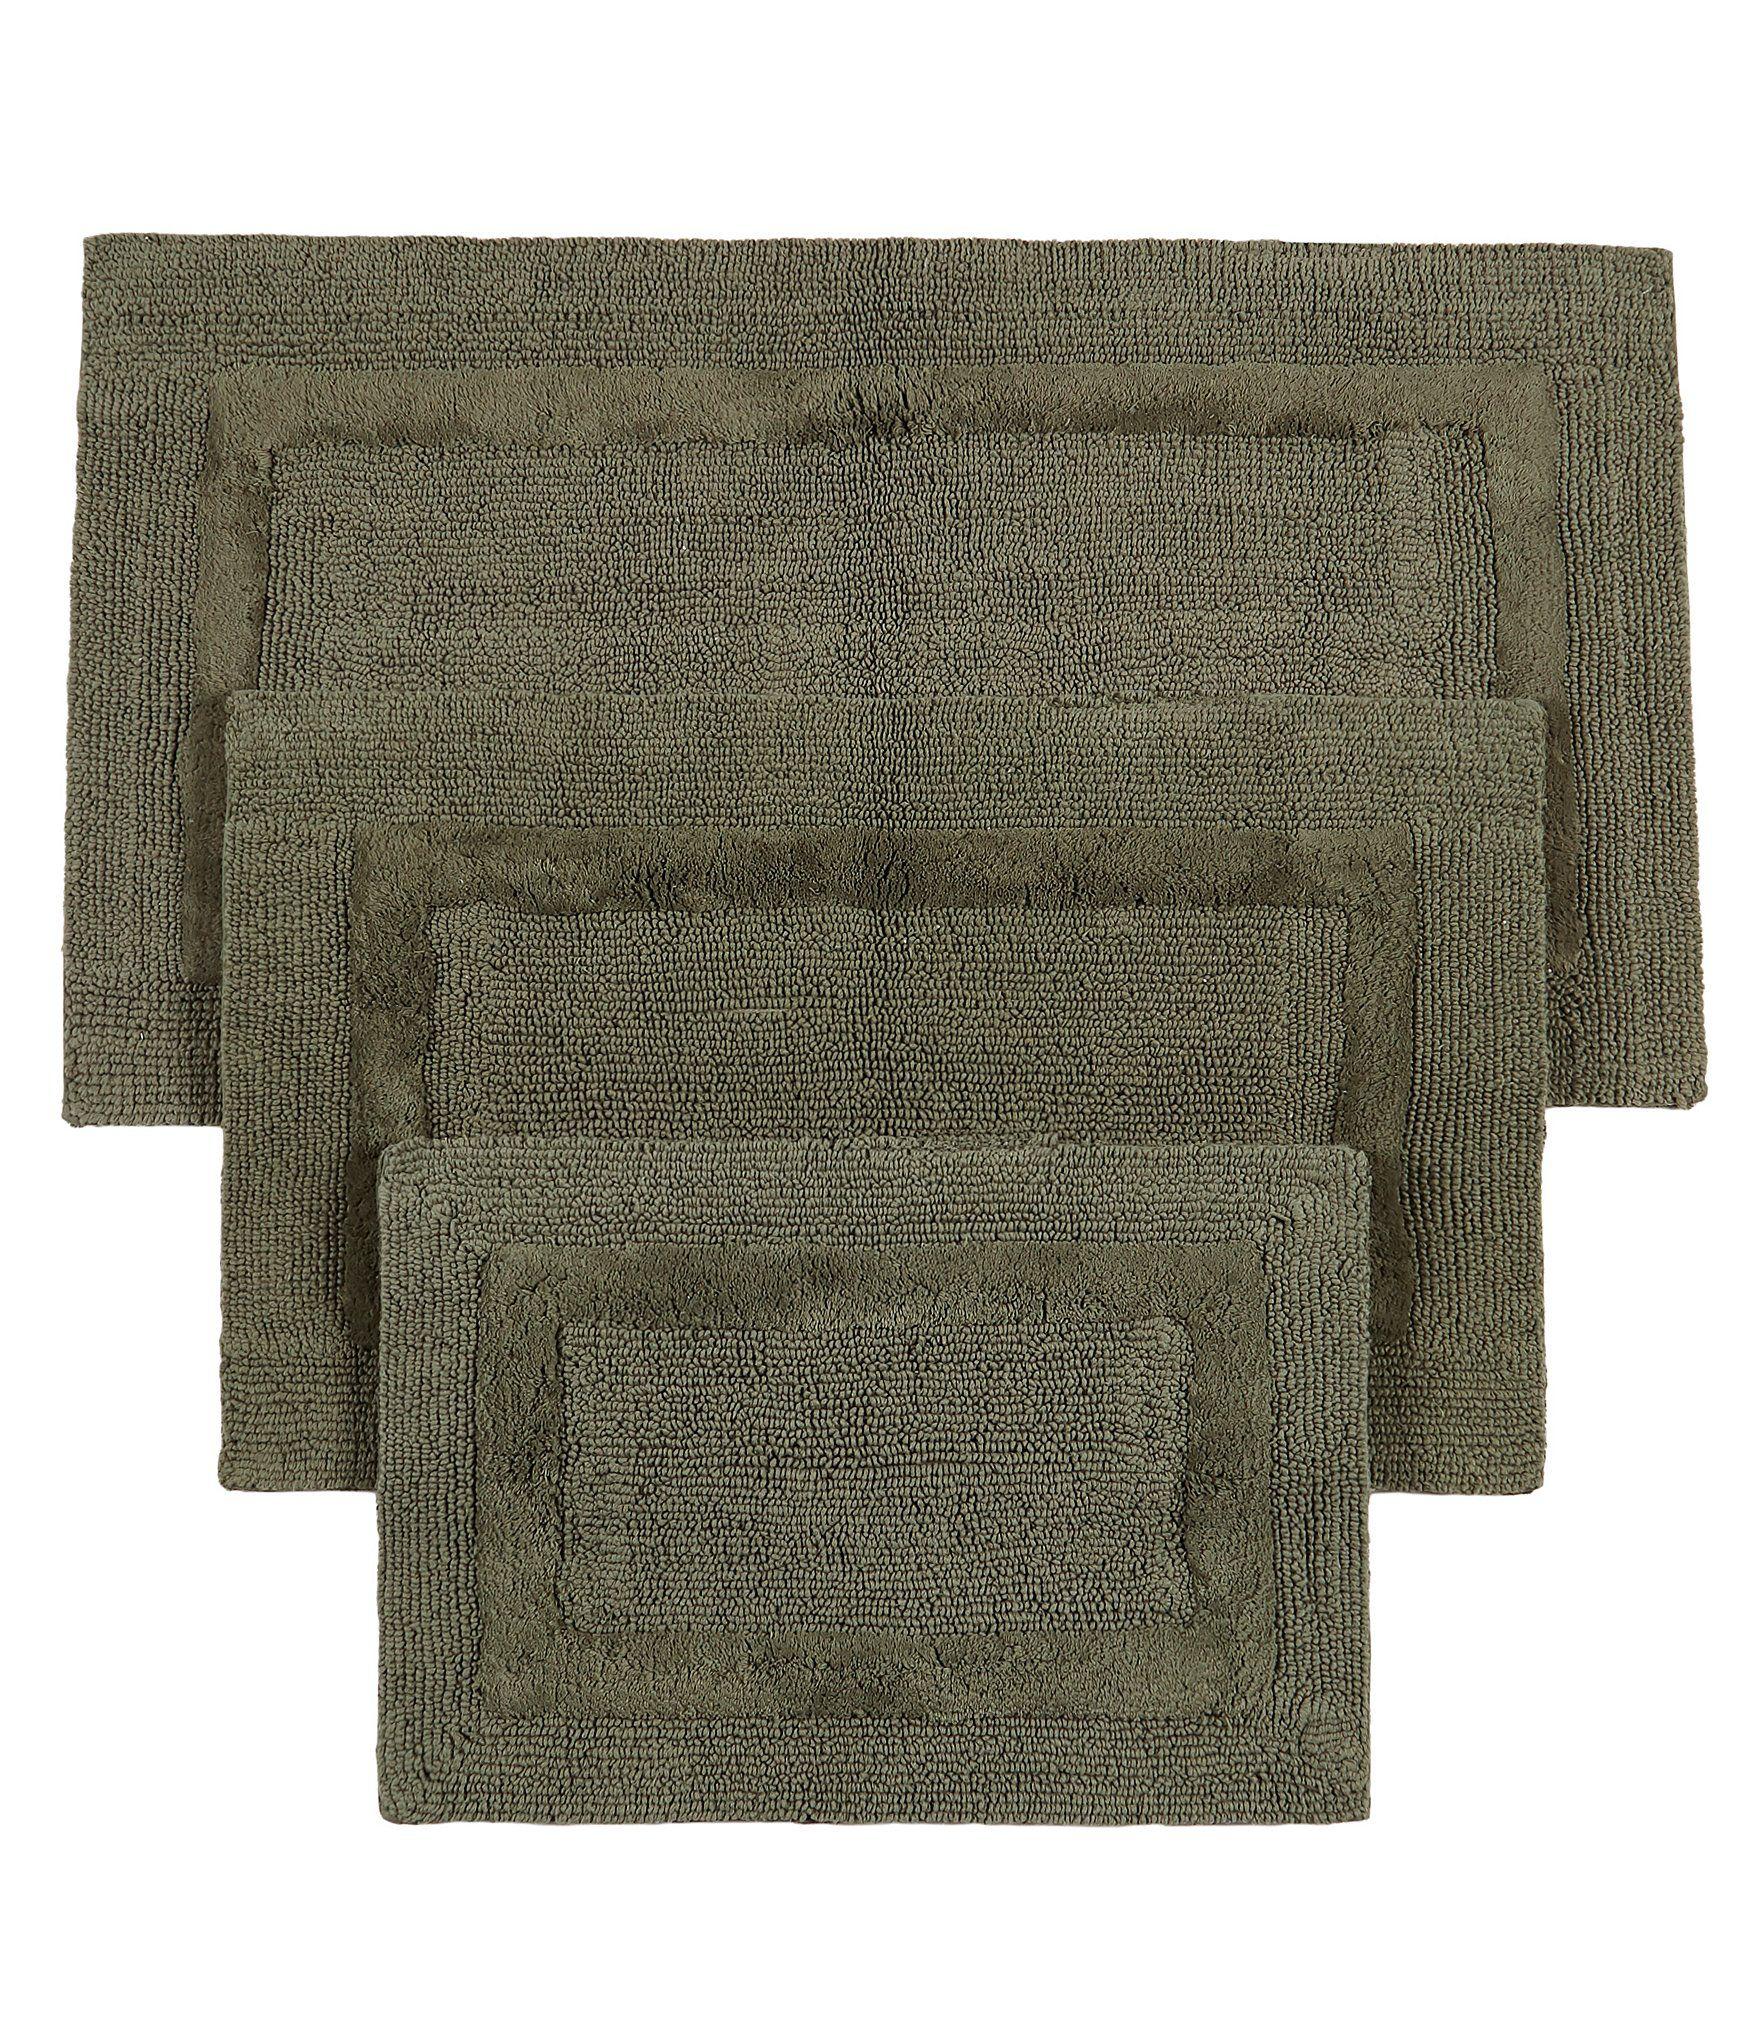 Southern Living Cotton Reversible Rug Dillard S Reversible Rug Medium Rugs Southern Living [ 2040 x 1760 Pixel ]